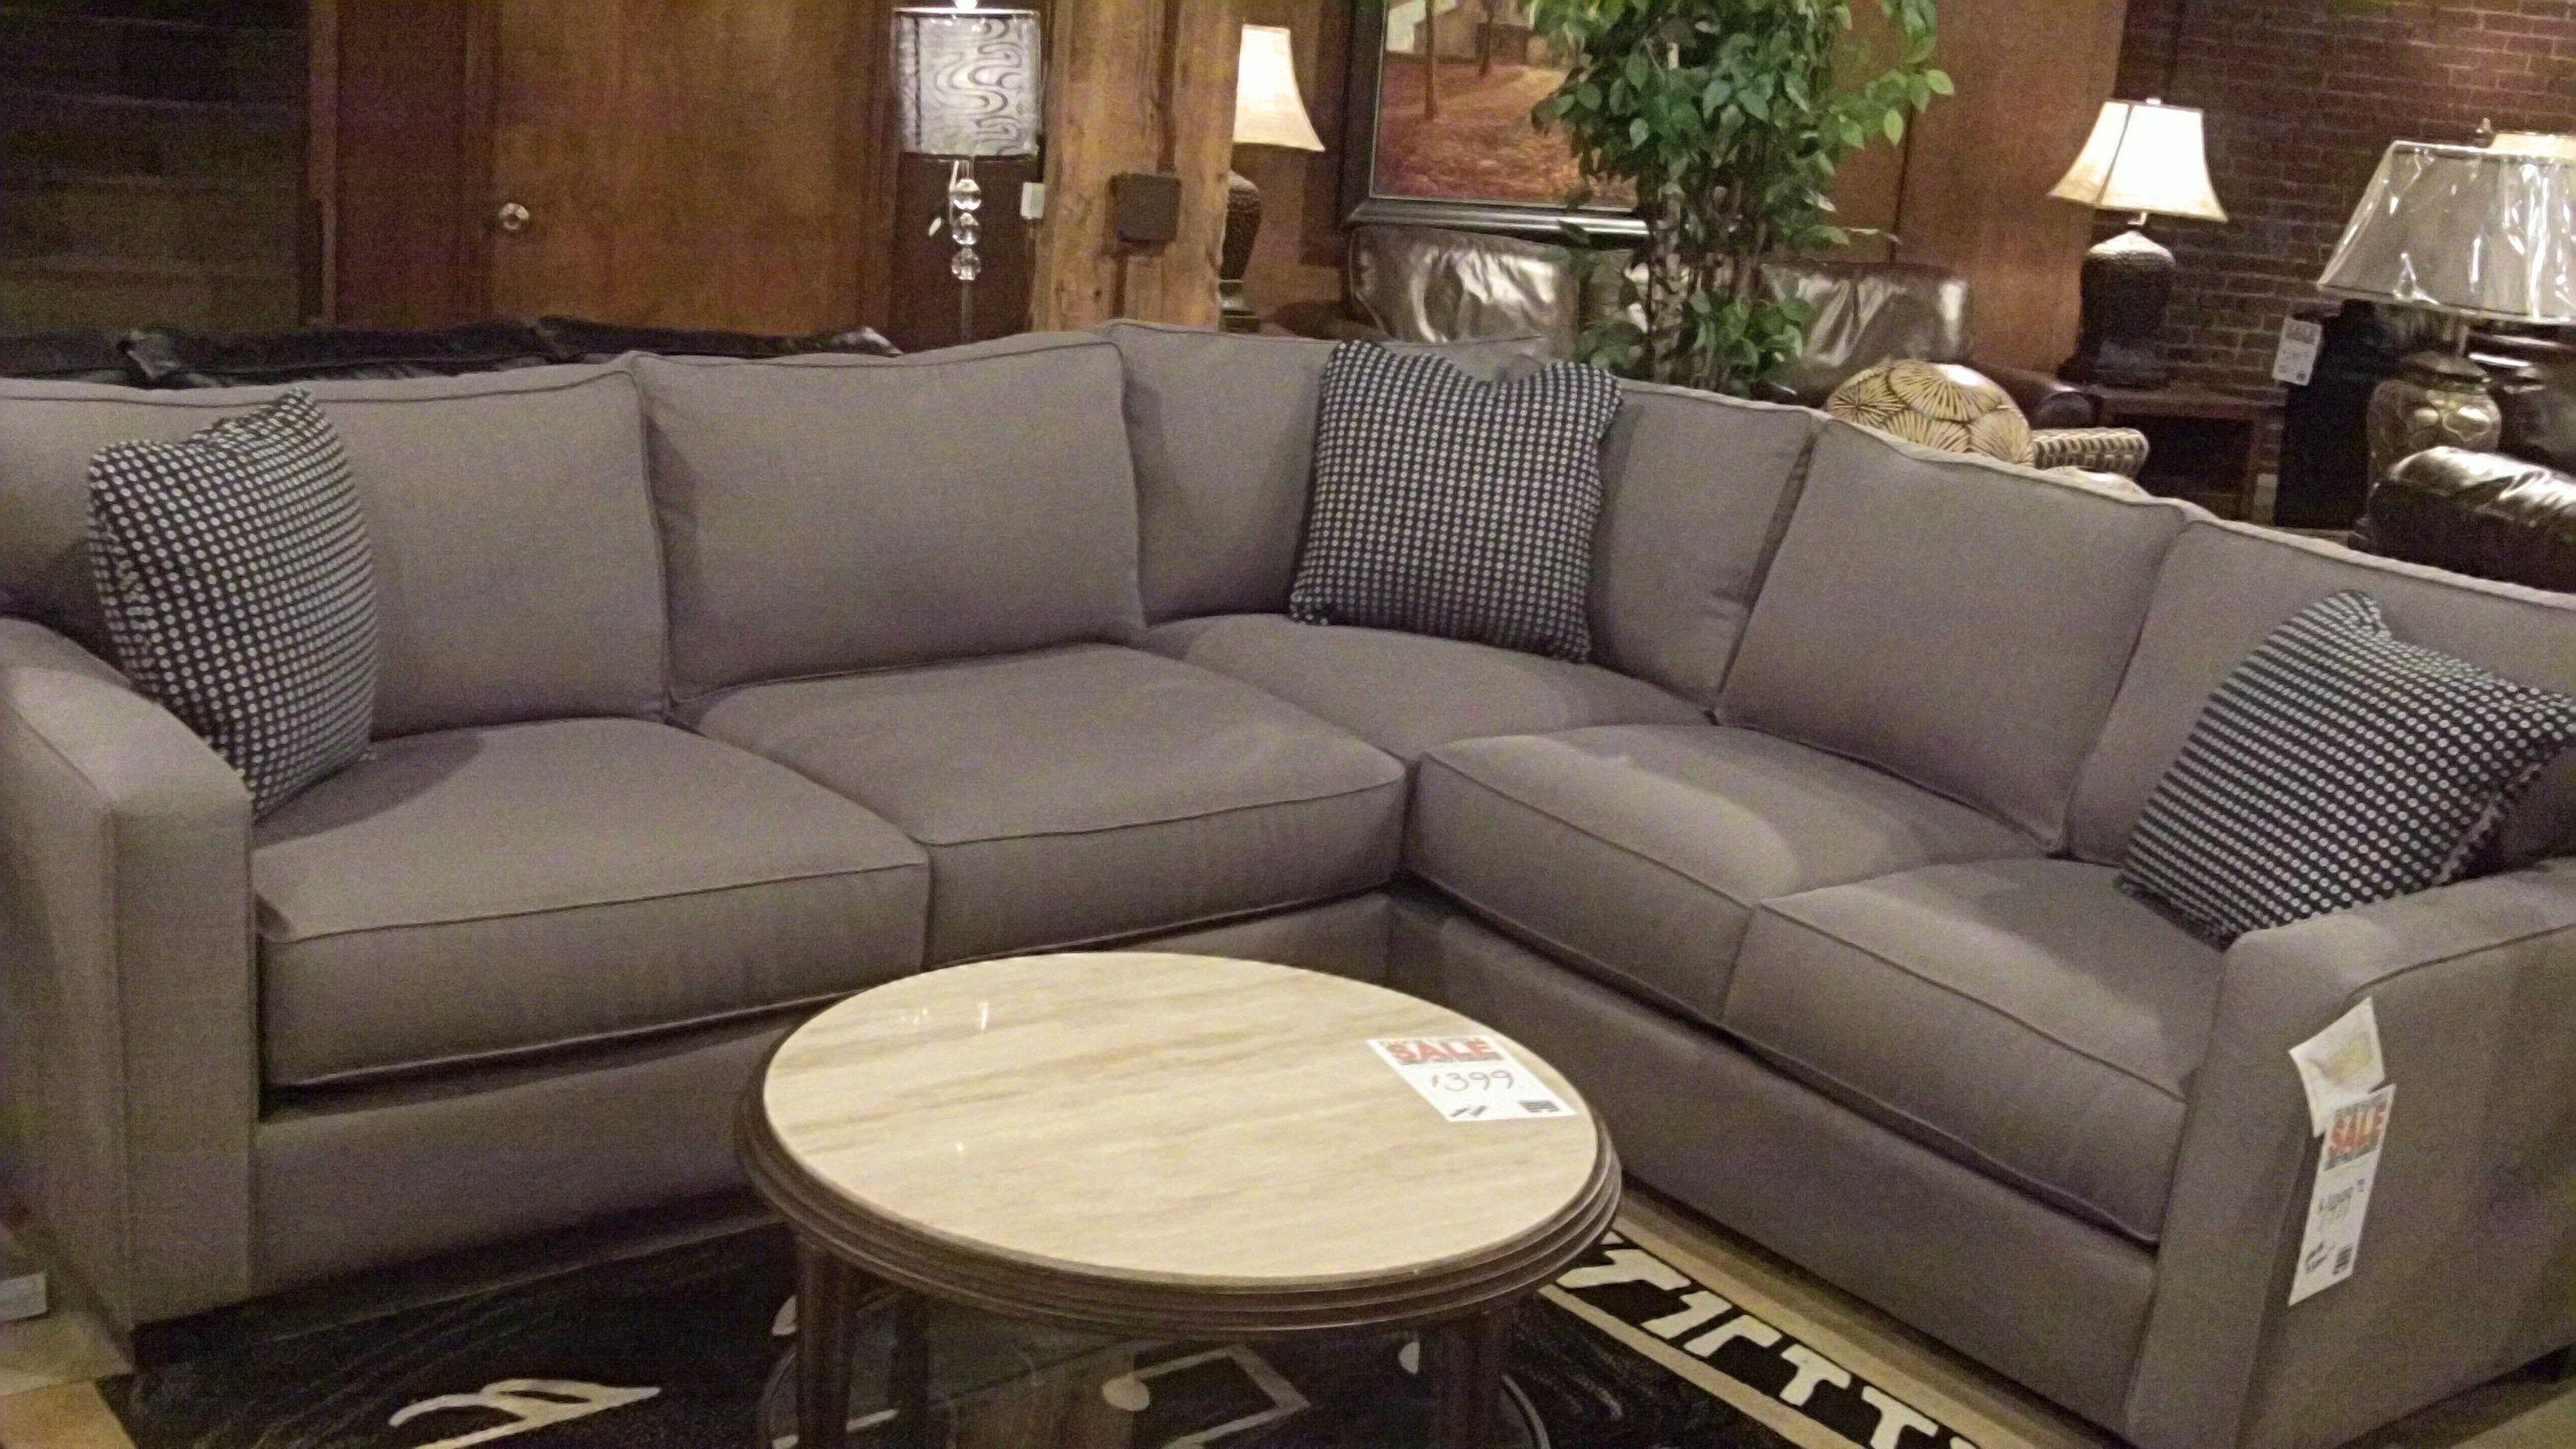 jonathan louis sofas prado corner sofa furniture village sectional available to custom order